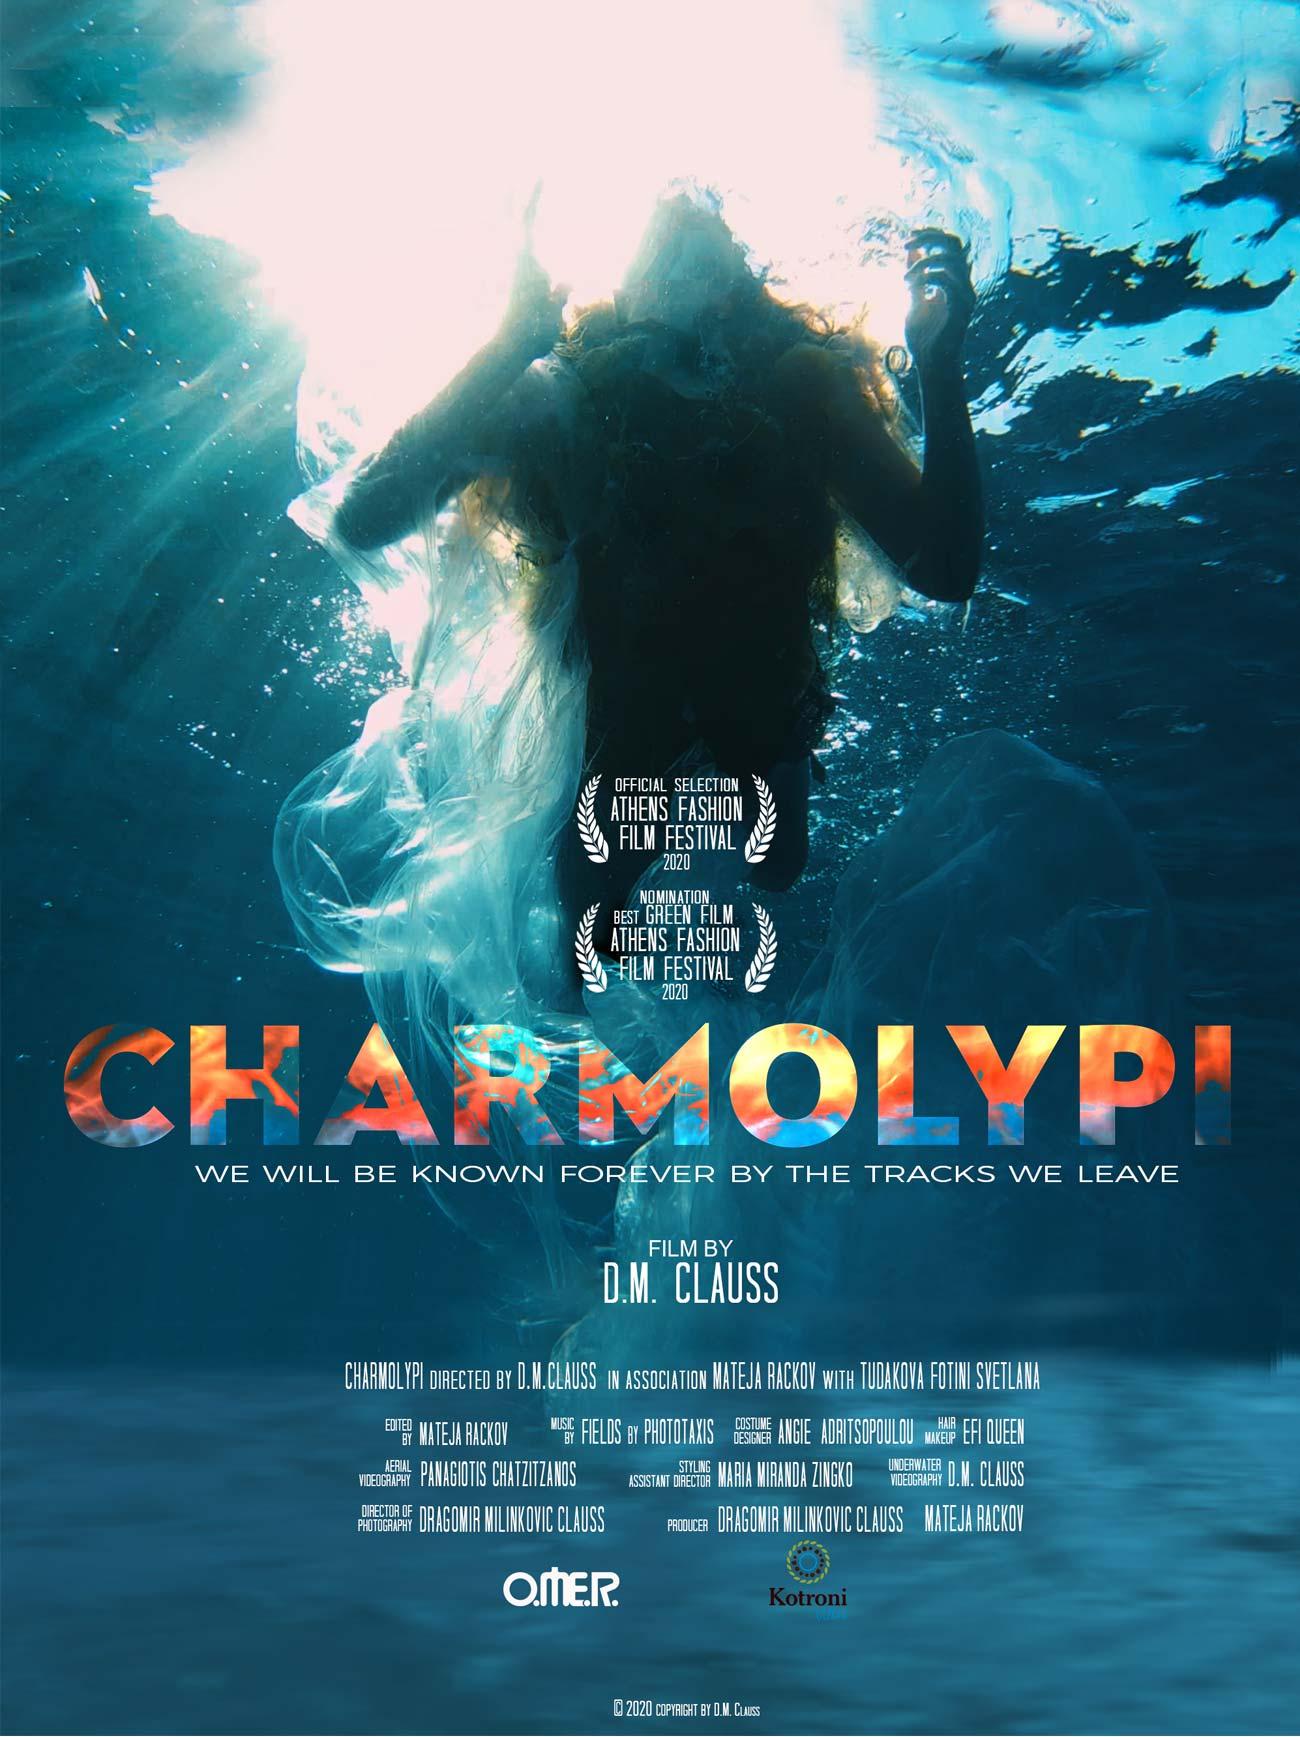 1-stories-charmolypi